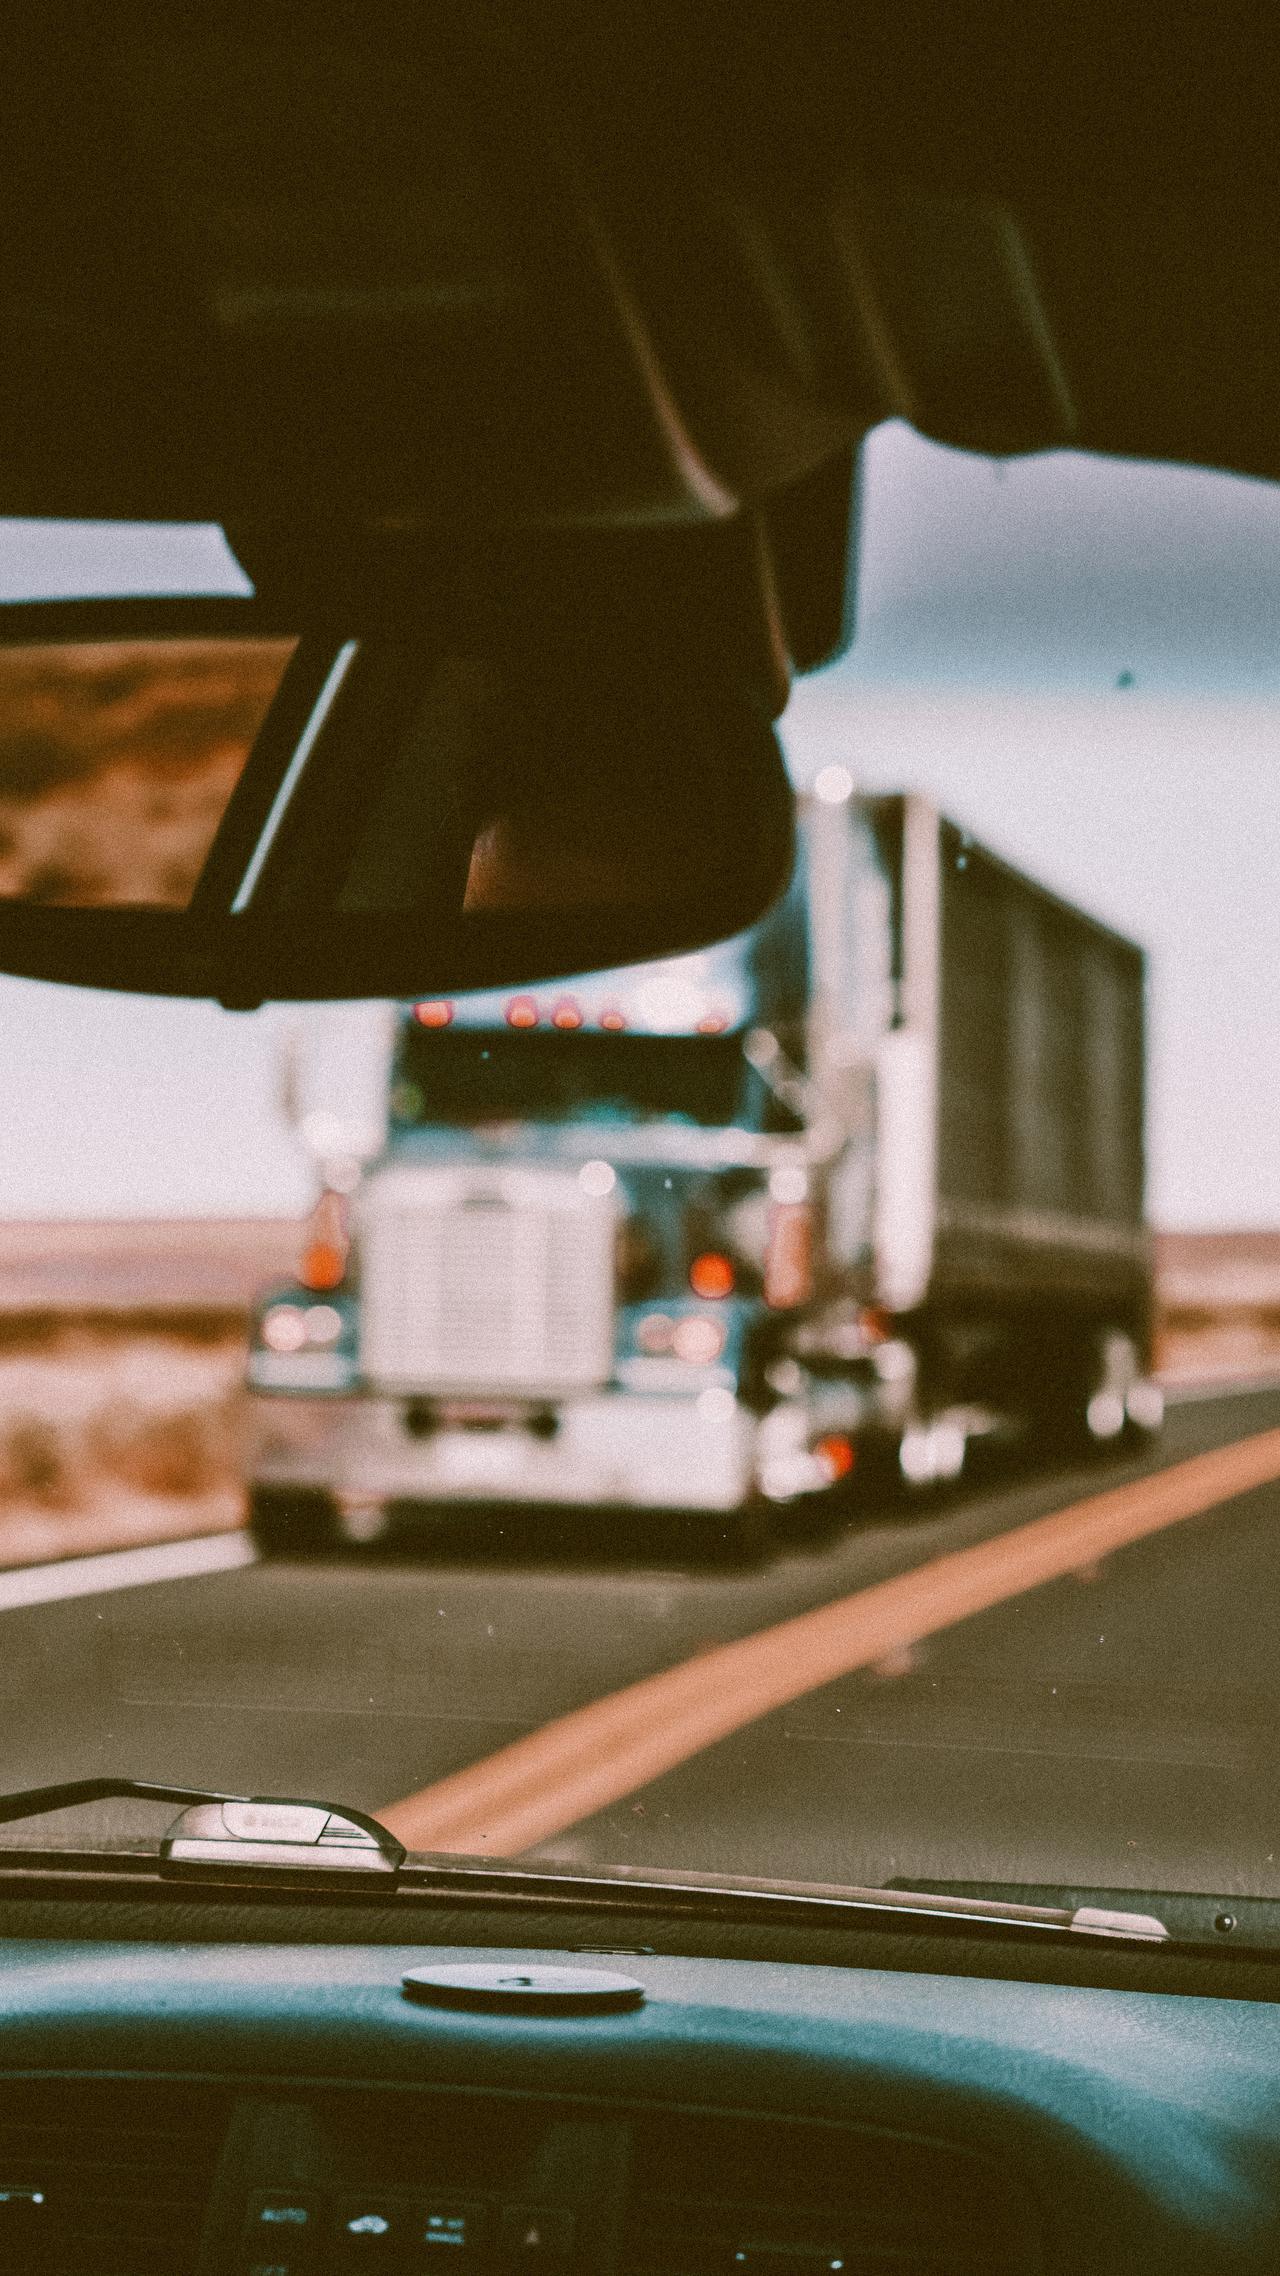 Blurred truck approaching a car